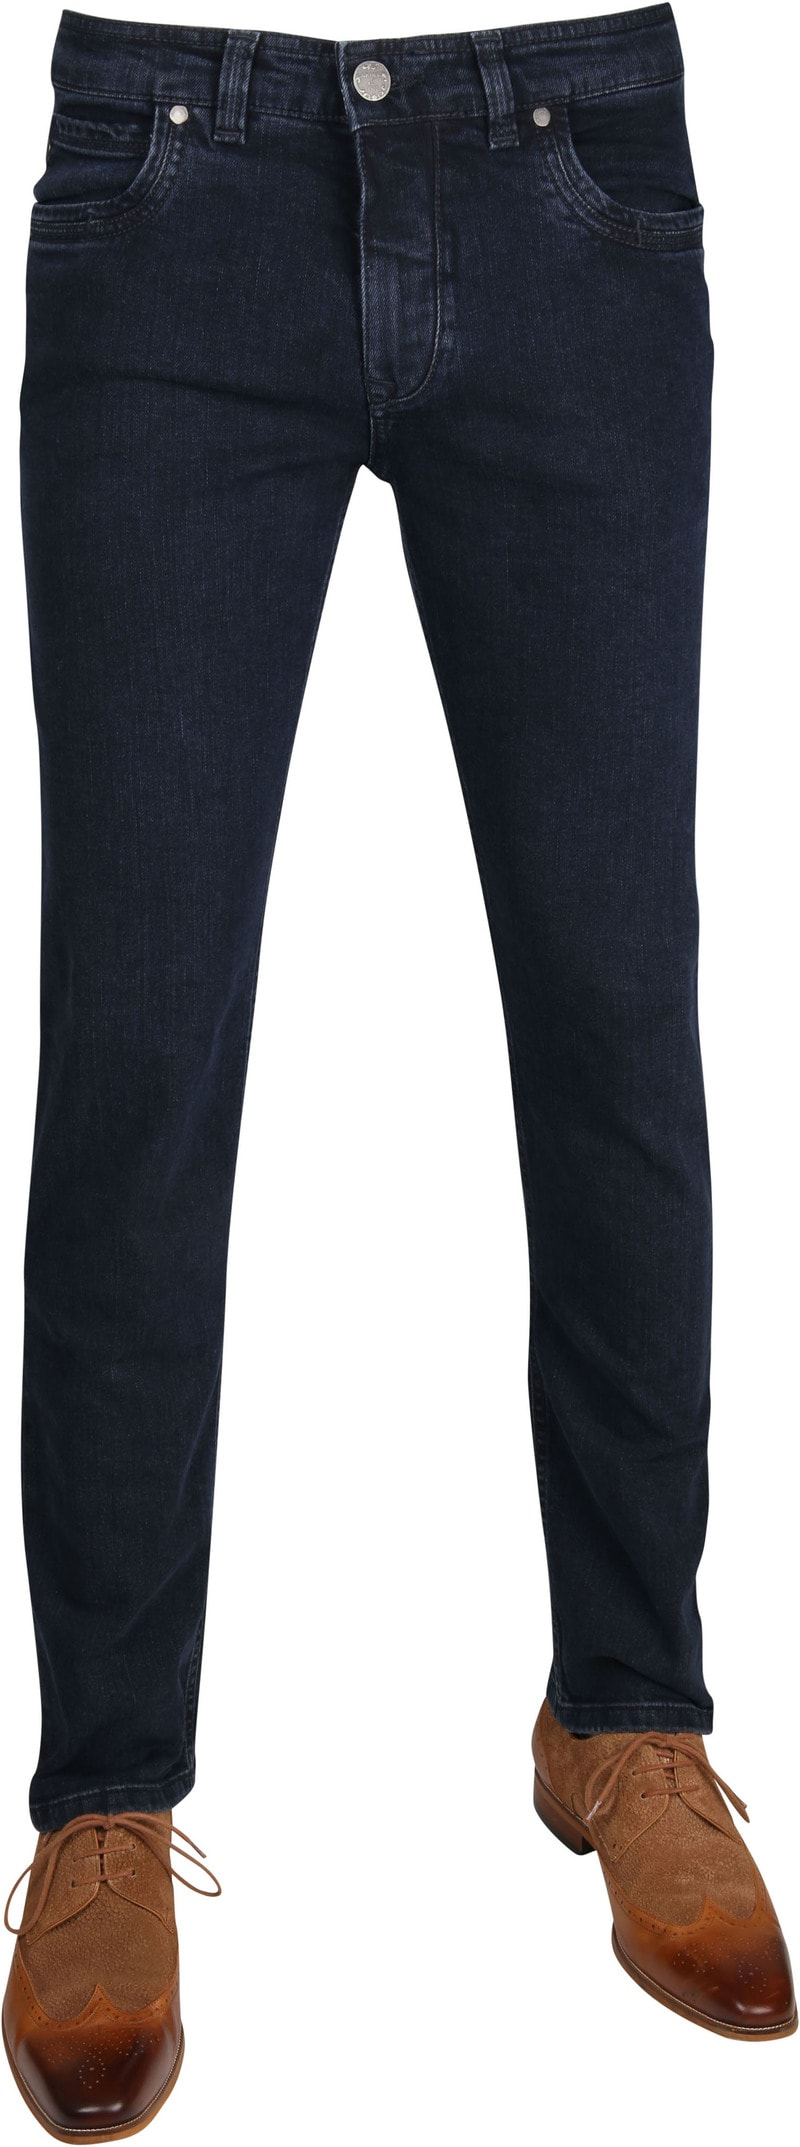 Gardeur Batu Jeans Navy foto 0